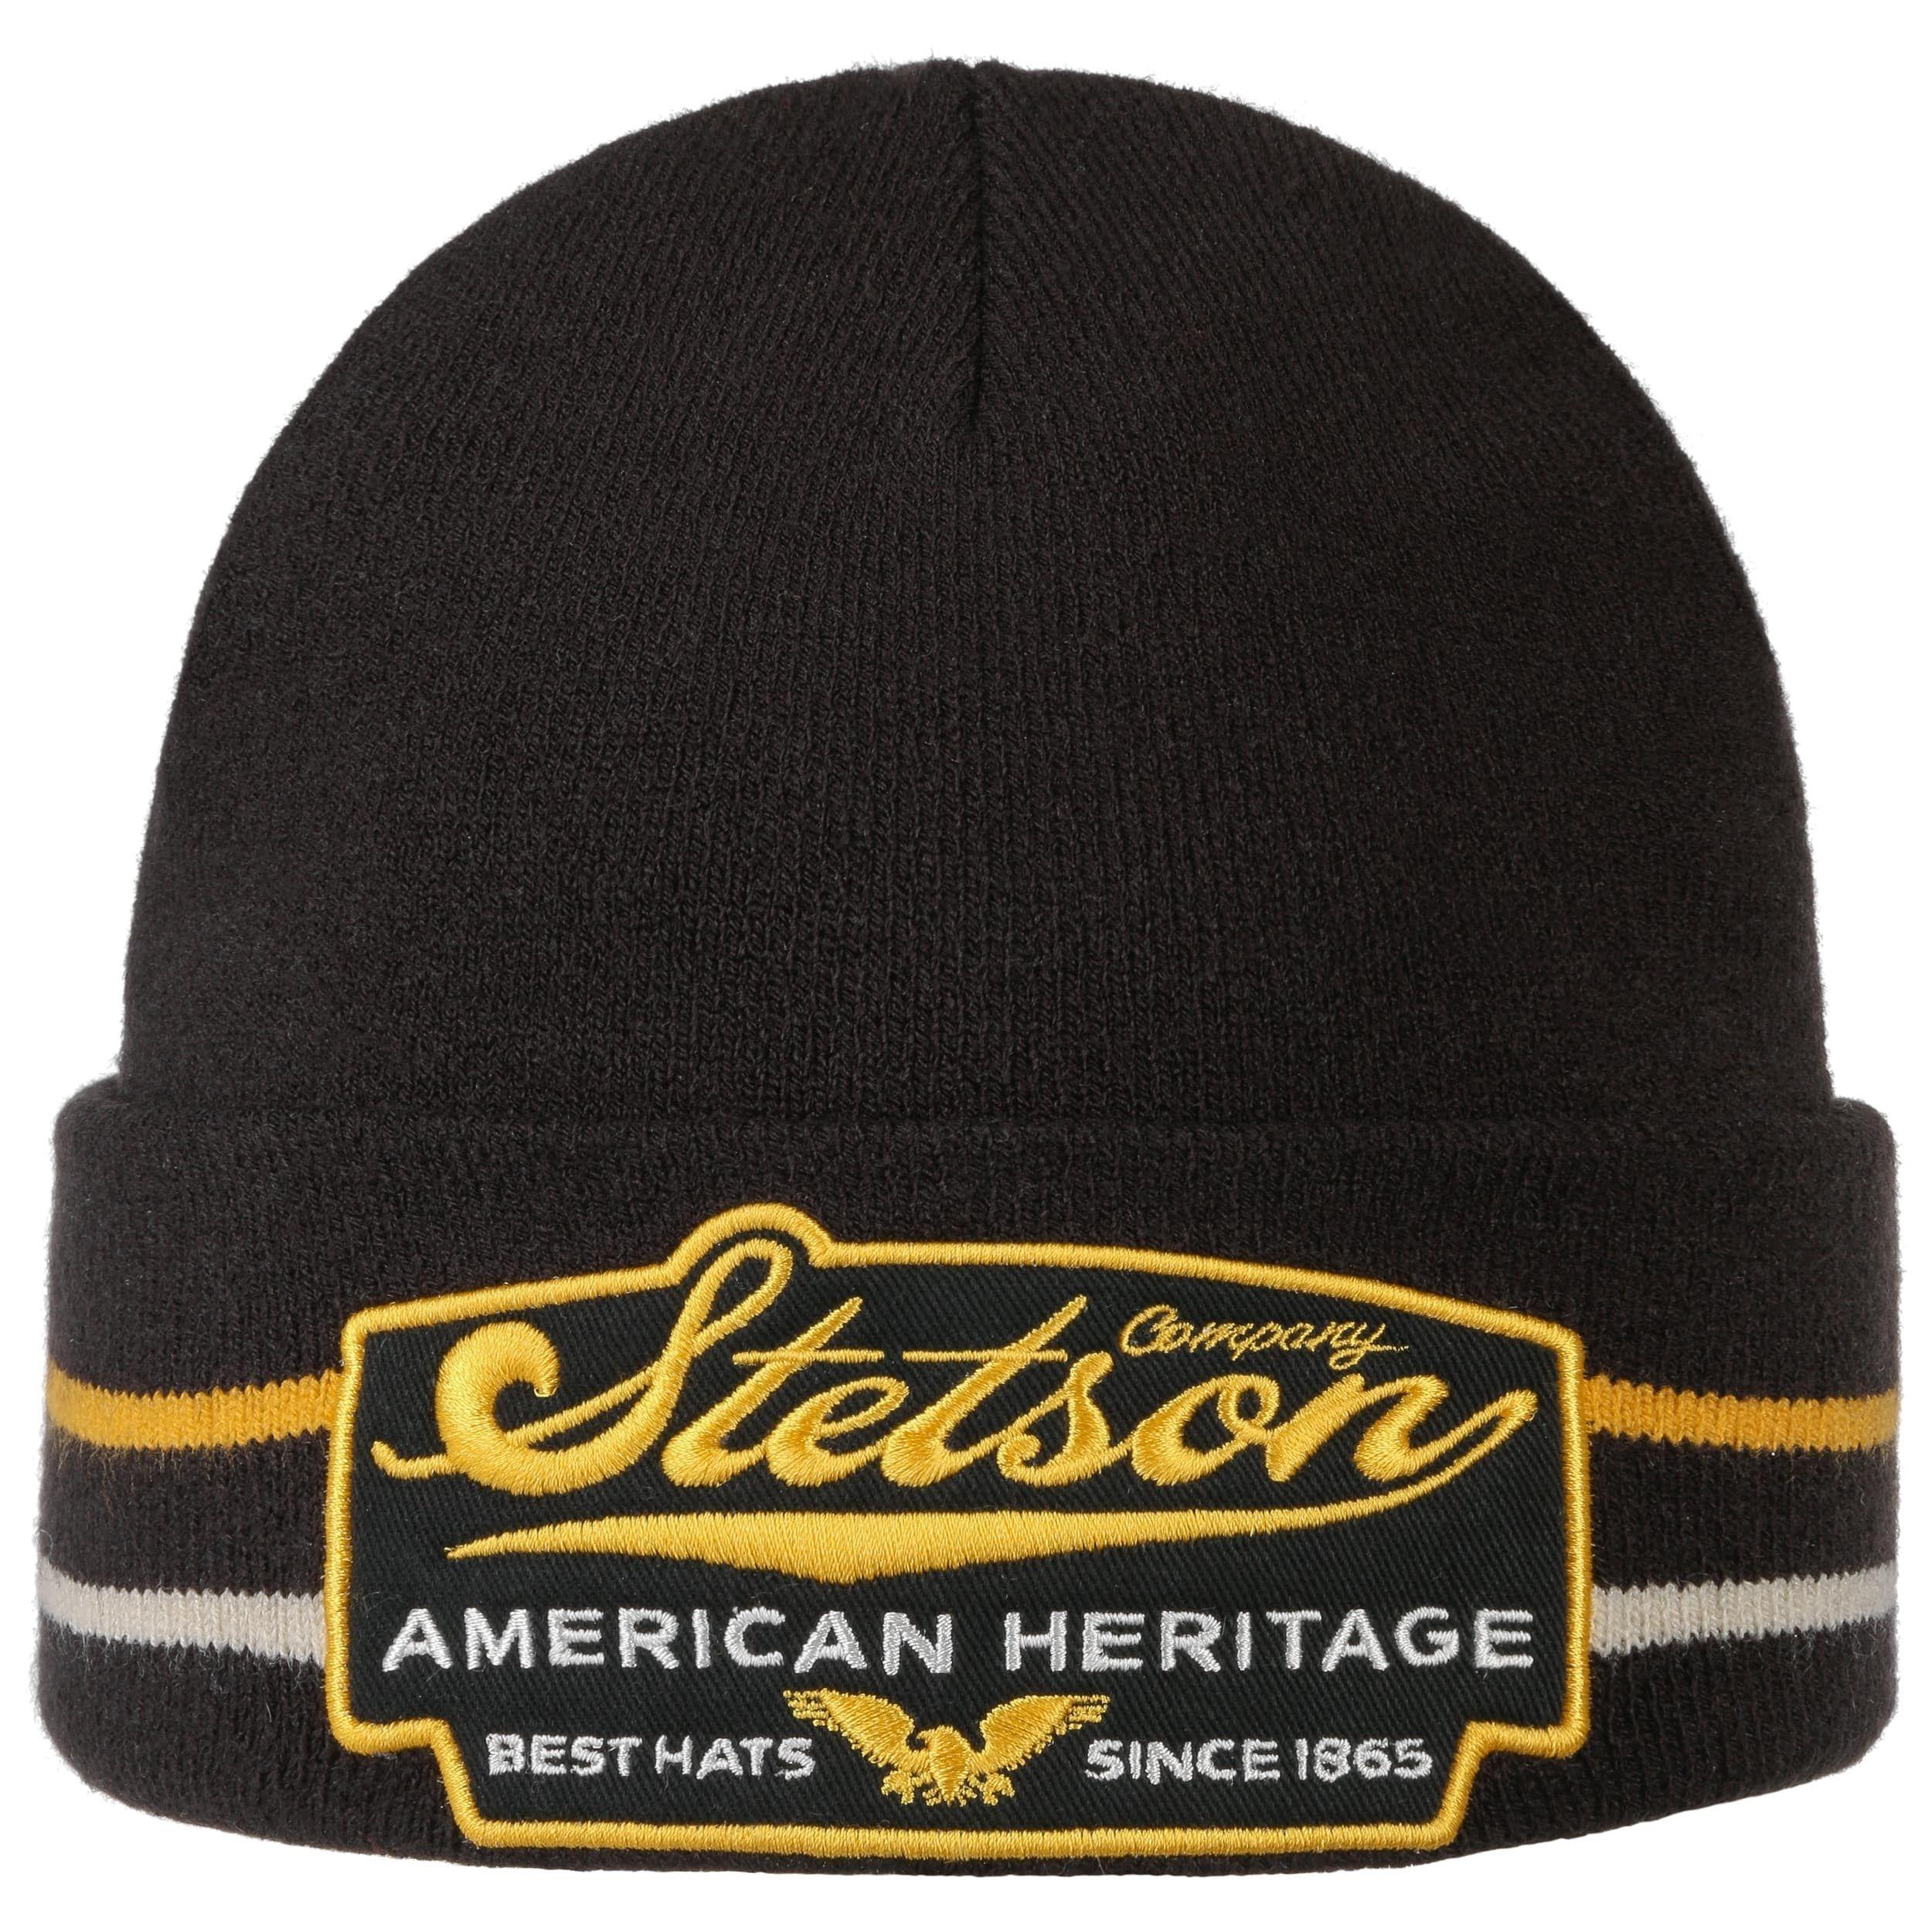 American Heritage Best Hats Beanie black